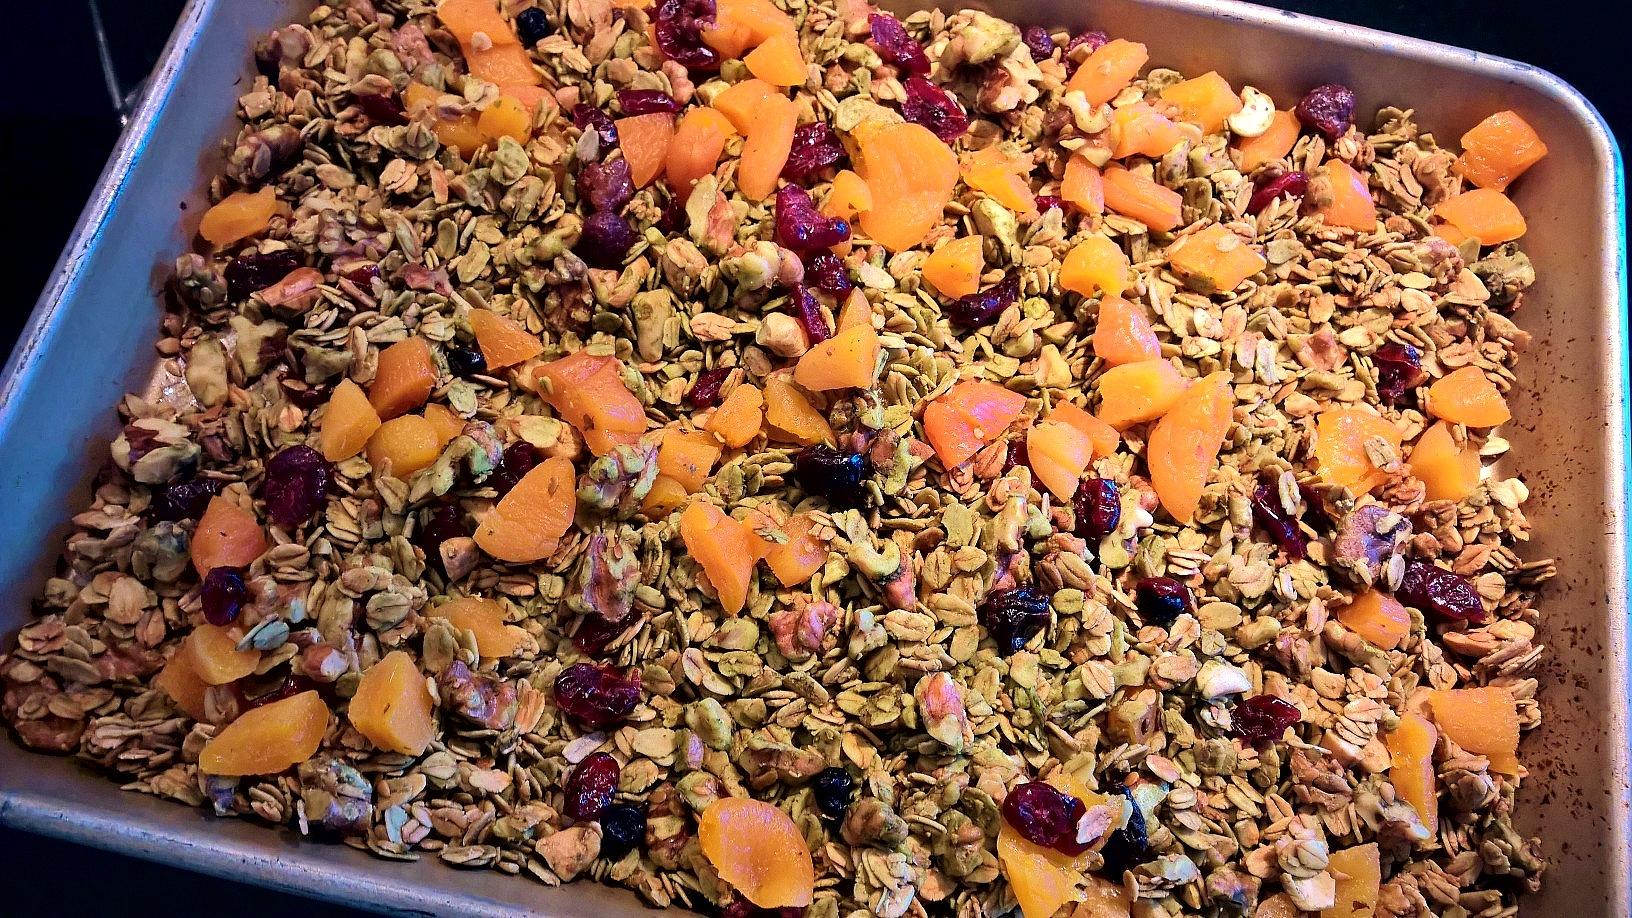 Recipe Courtesy of The Healthy Matcha Cookbook